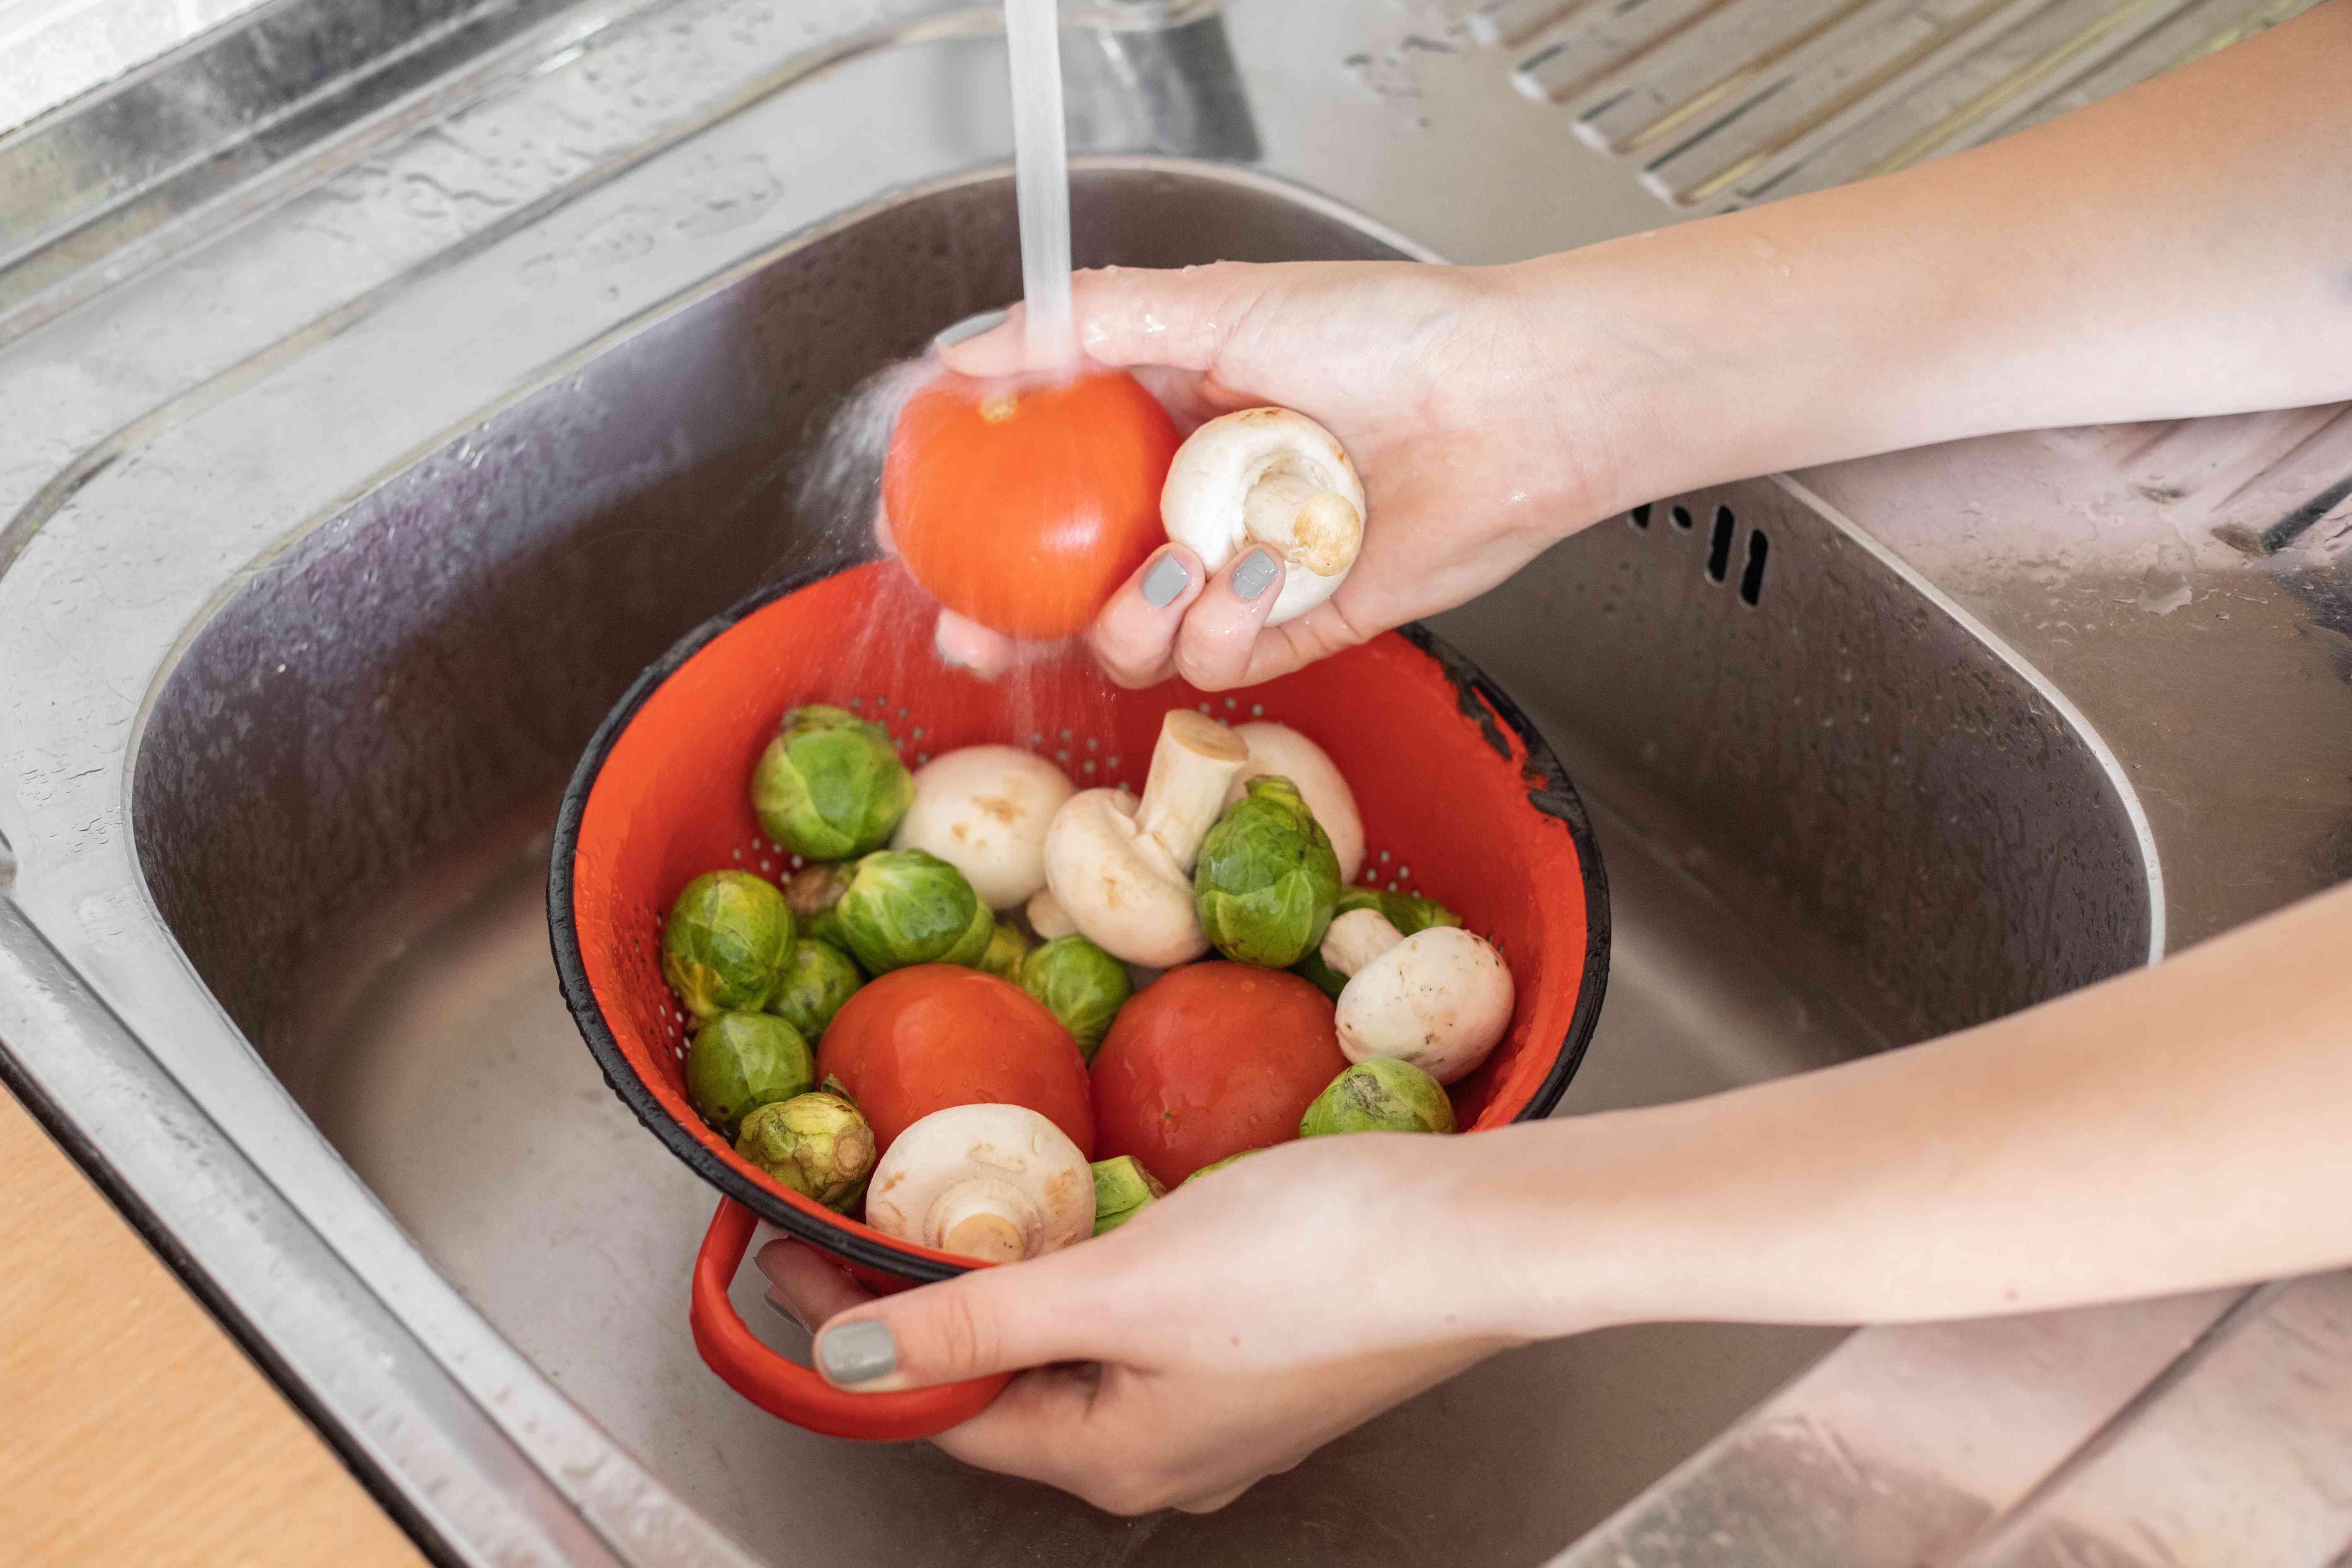 hands wash bowl of veggies with water in steel sink